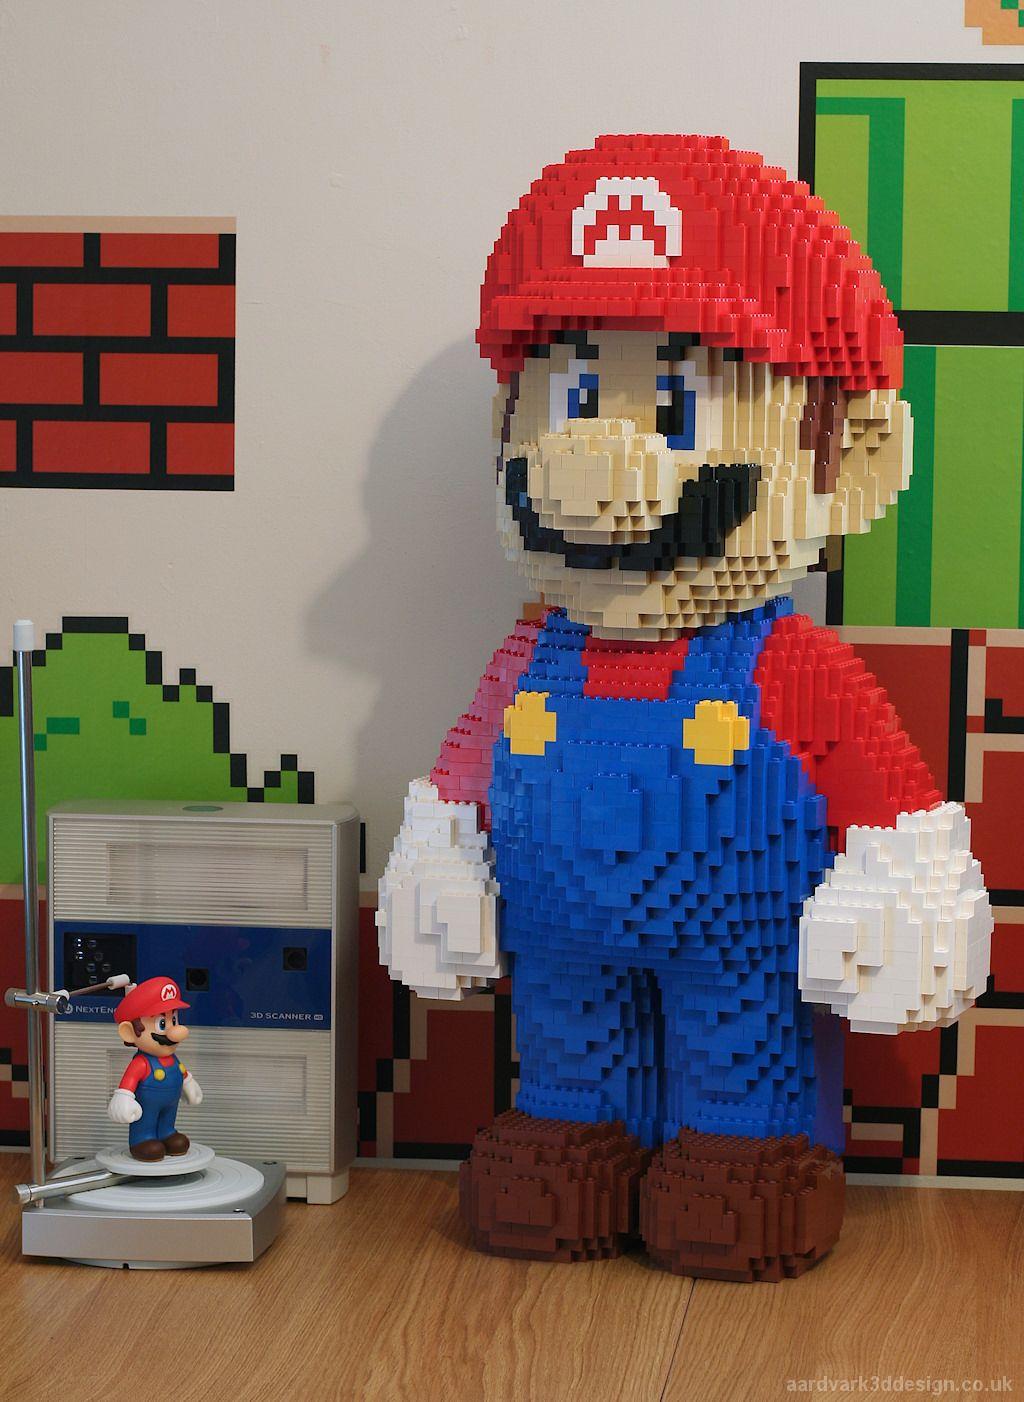 Awesome Lego Mario Model Built Using Nextengine 3d Scanner Lego